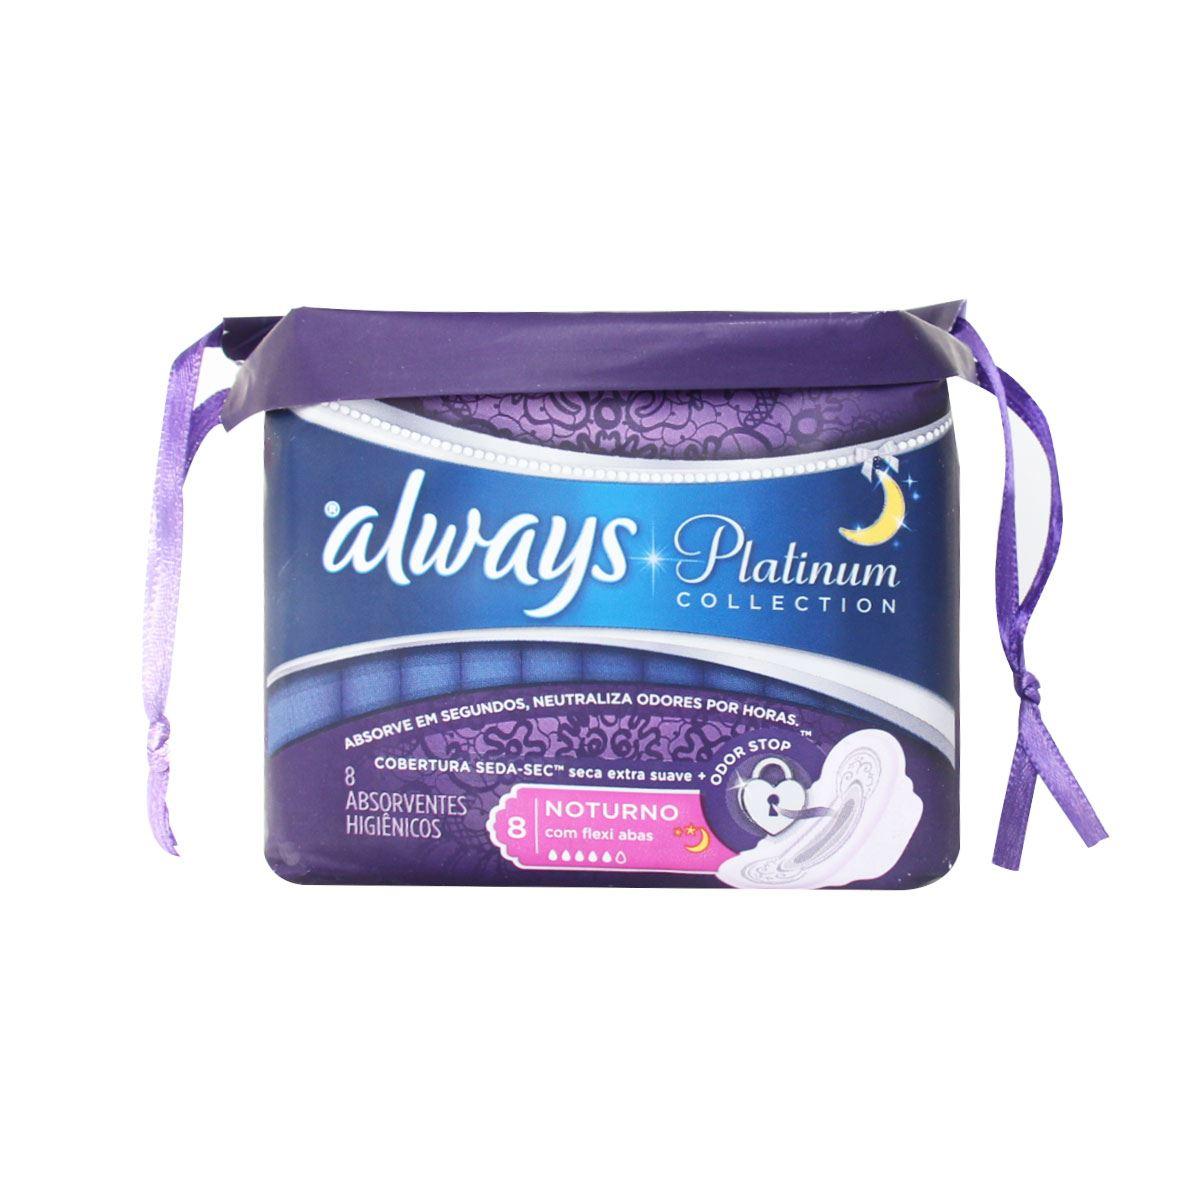 Comprar Always Platinum Nocturna C/A Toalla Femenina 8 Piezas